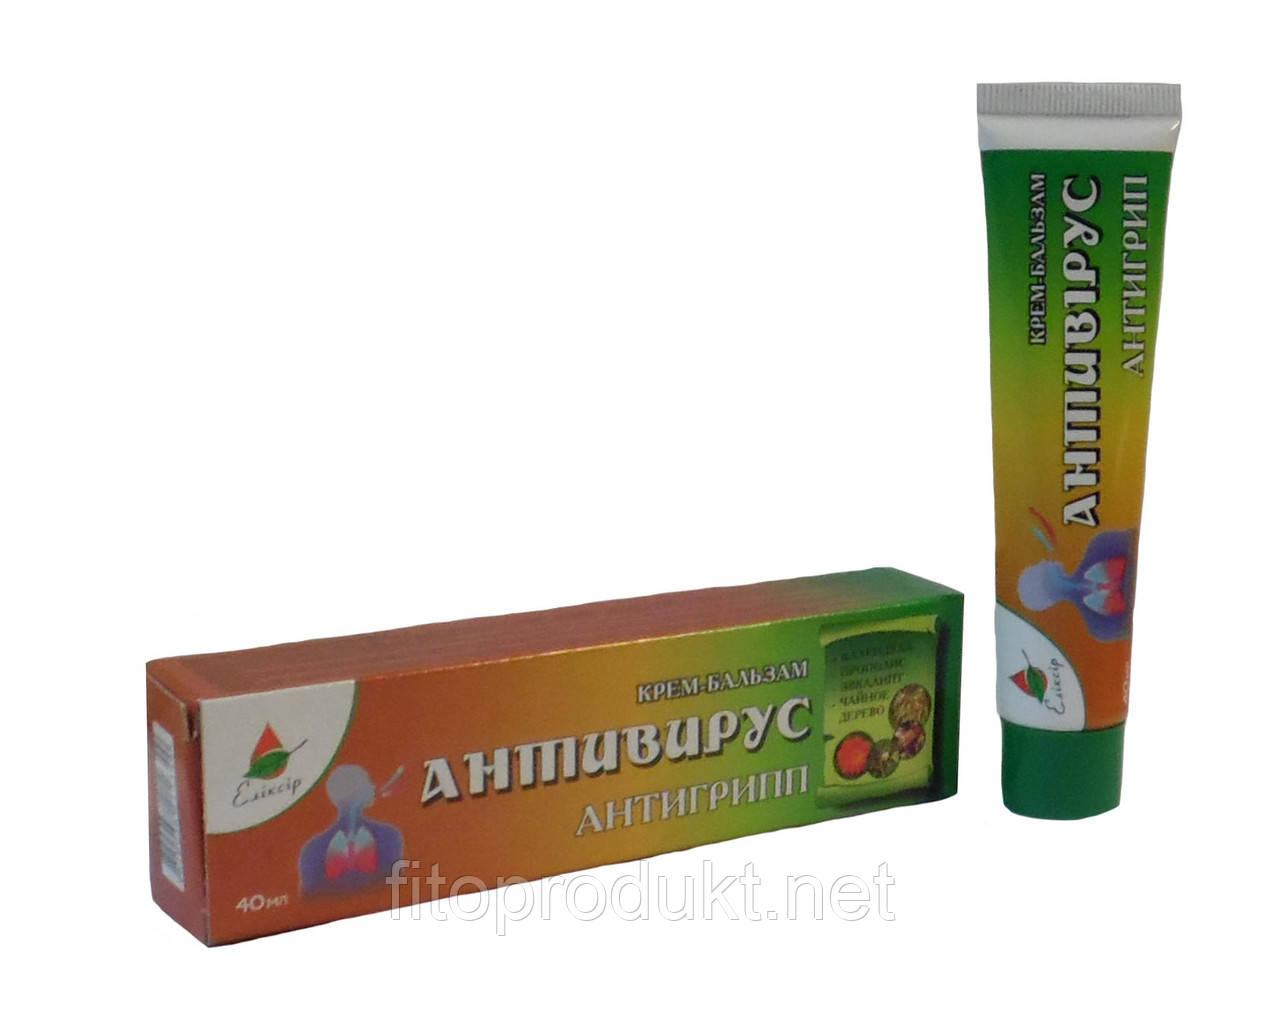 Антивирус - антигрипп крем-бальзам 40 мл Эликсир